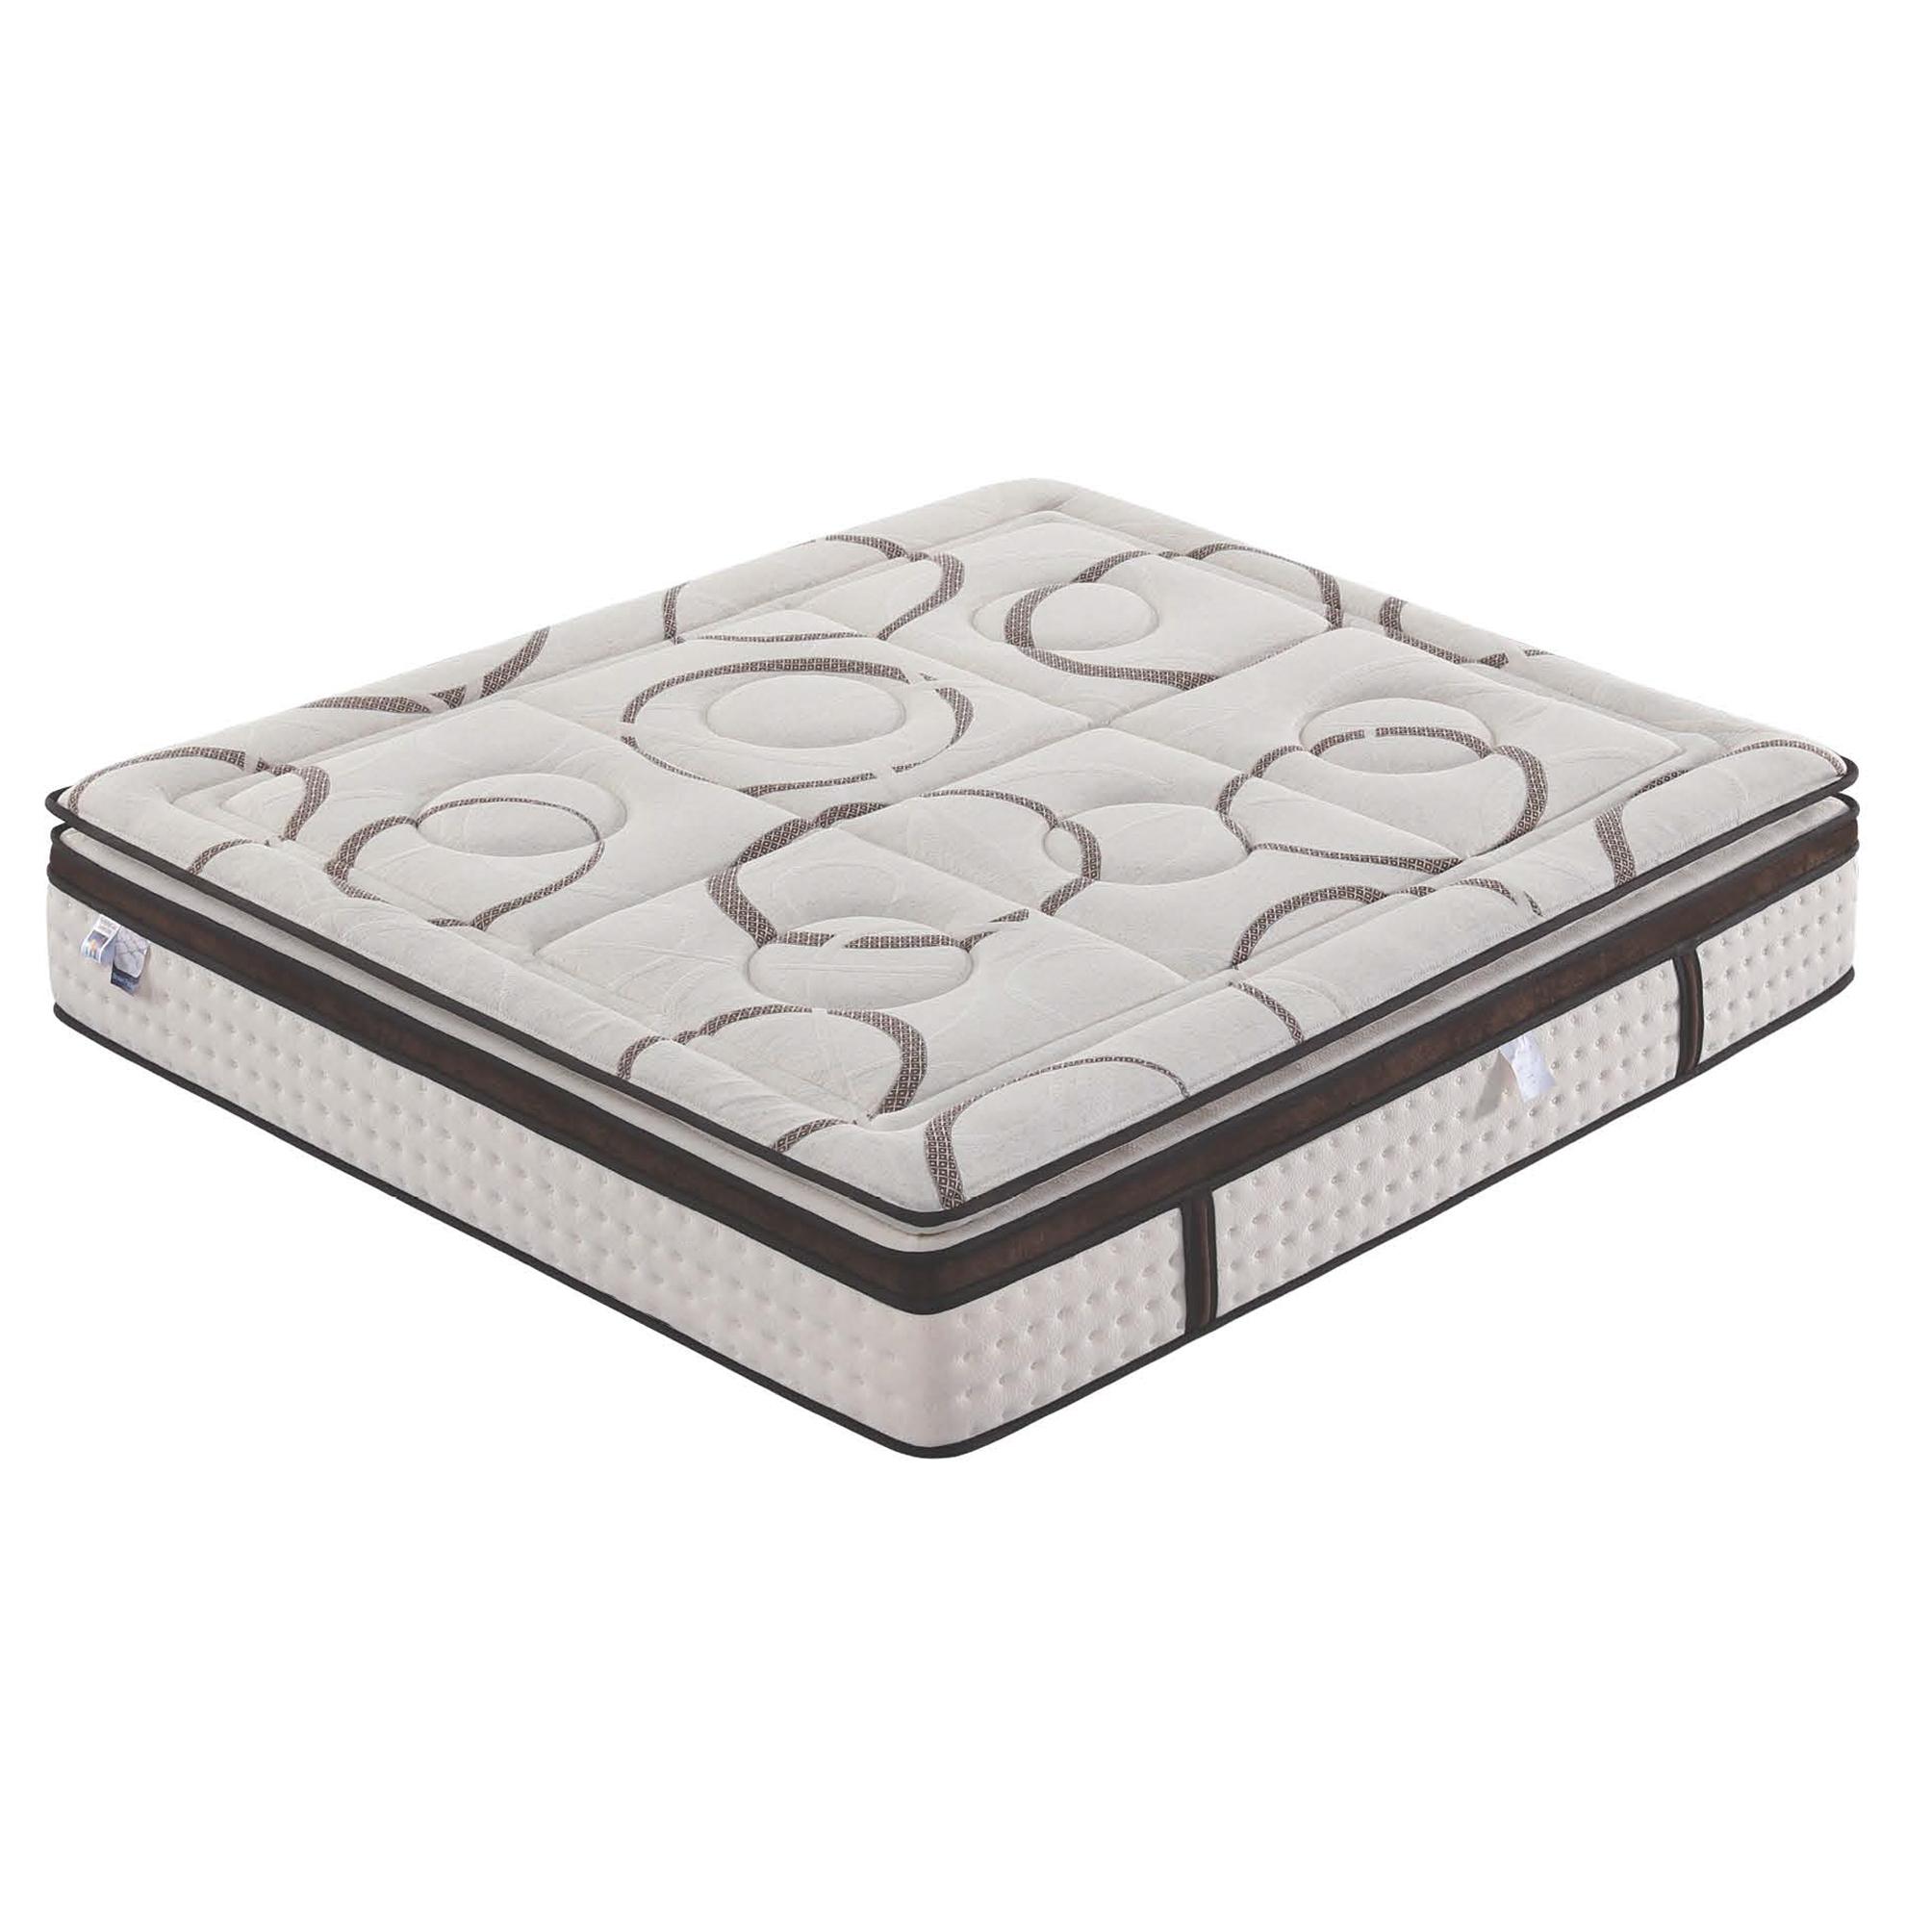 Single Bed Micro Pocket Spring Pillow top & Euro top Mattress - Jozy Mattress   Jozy.net